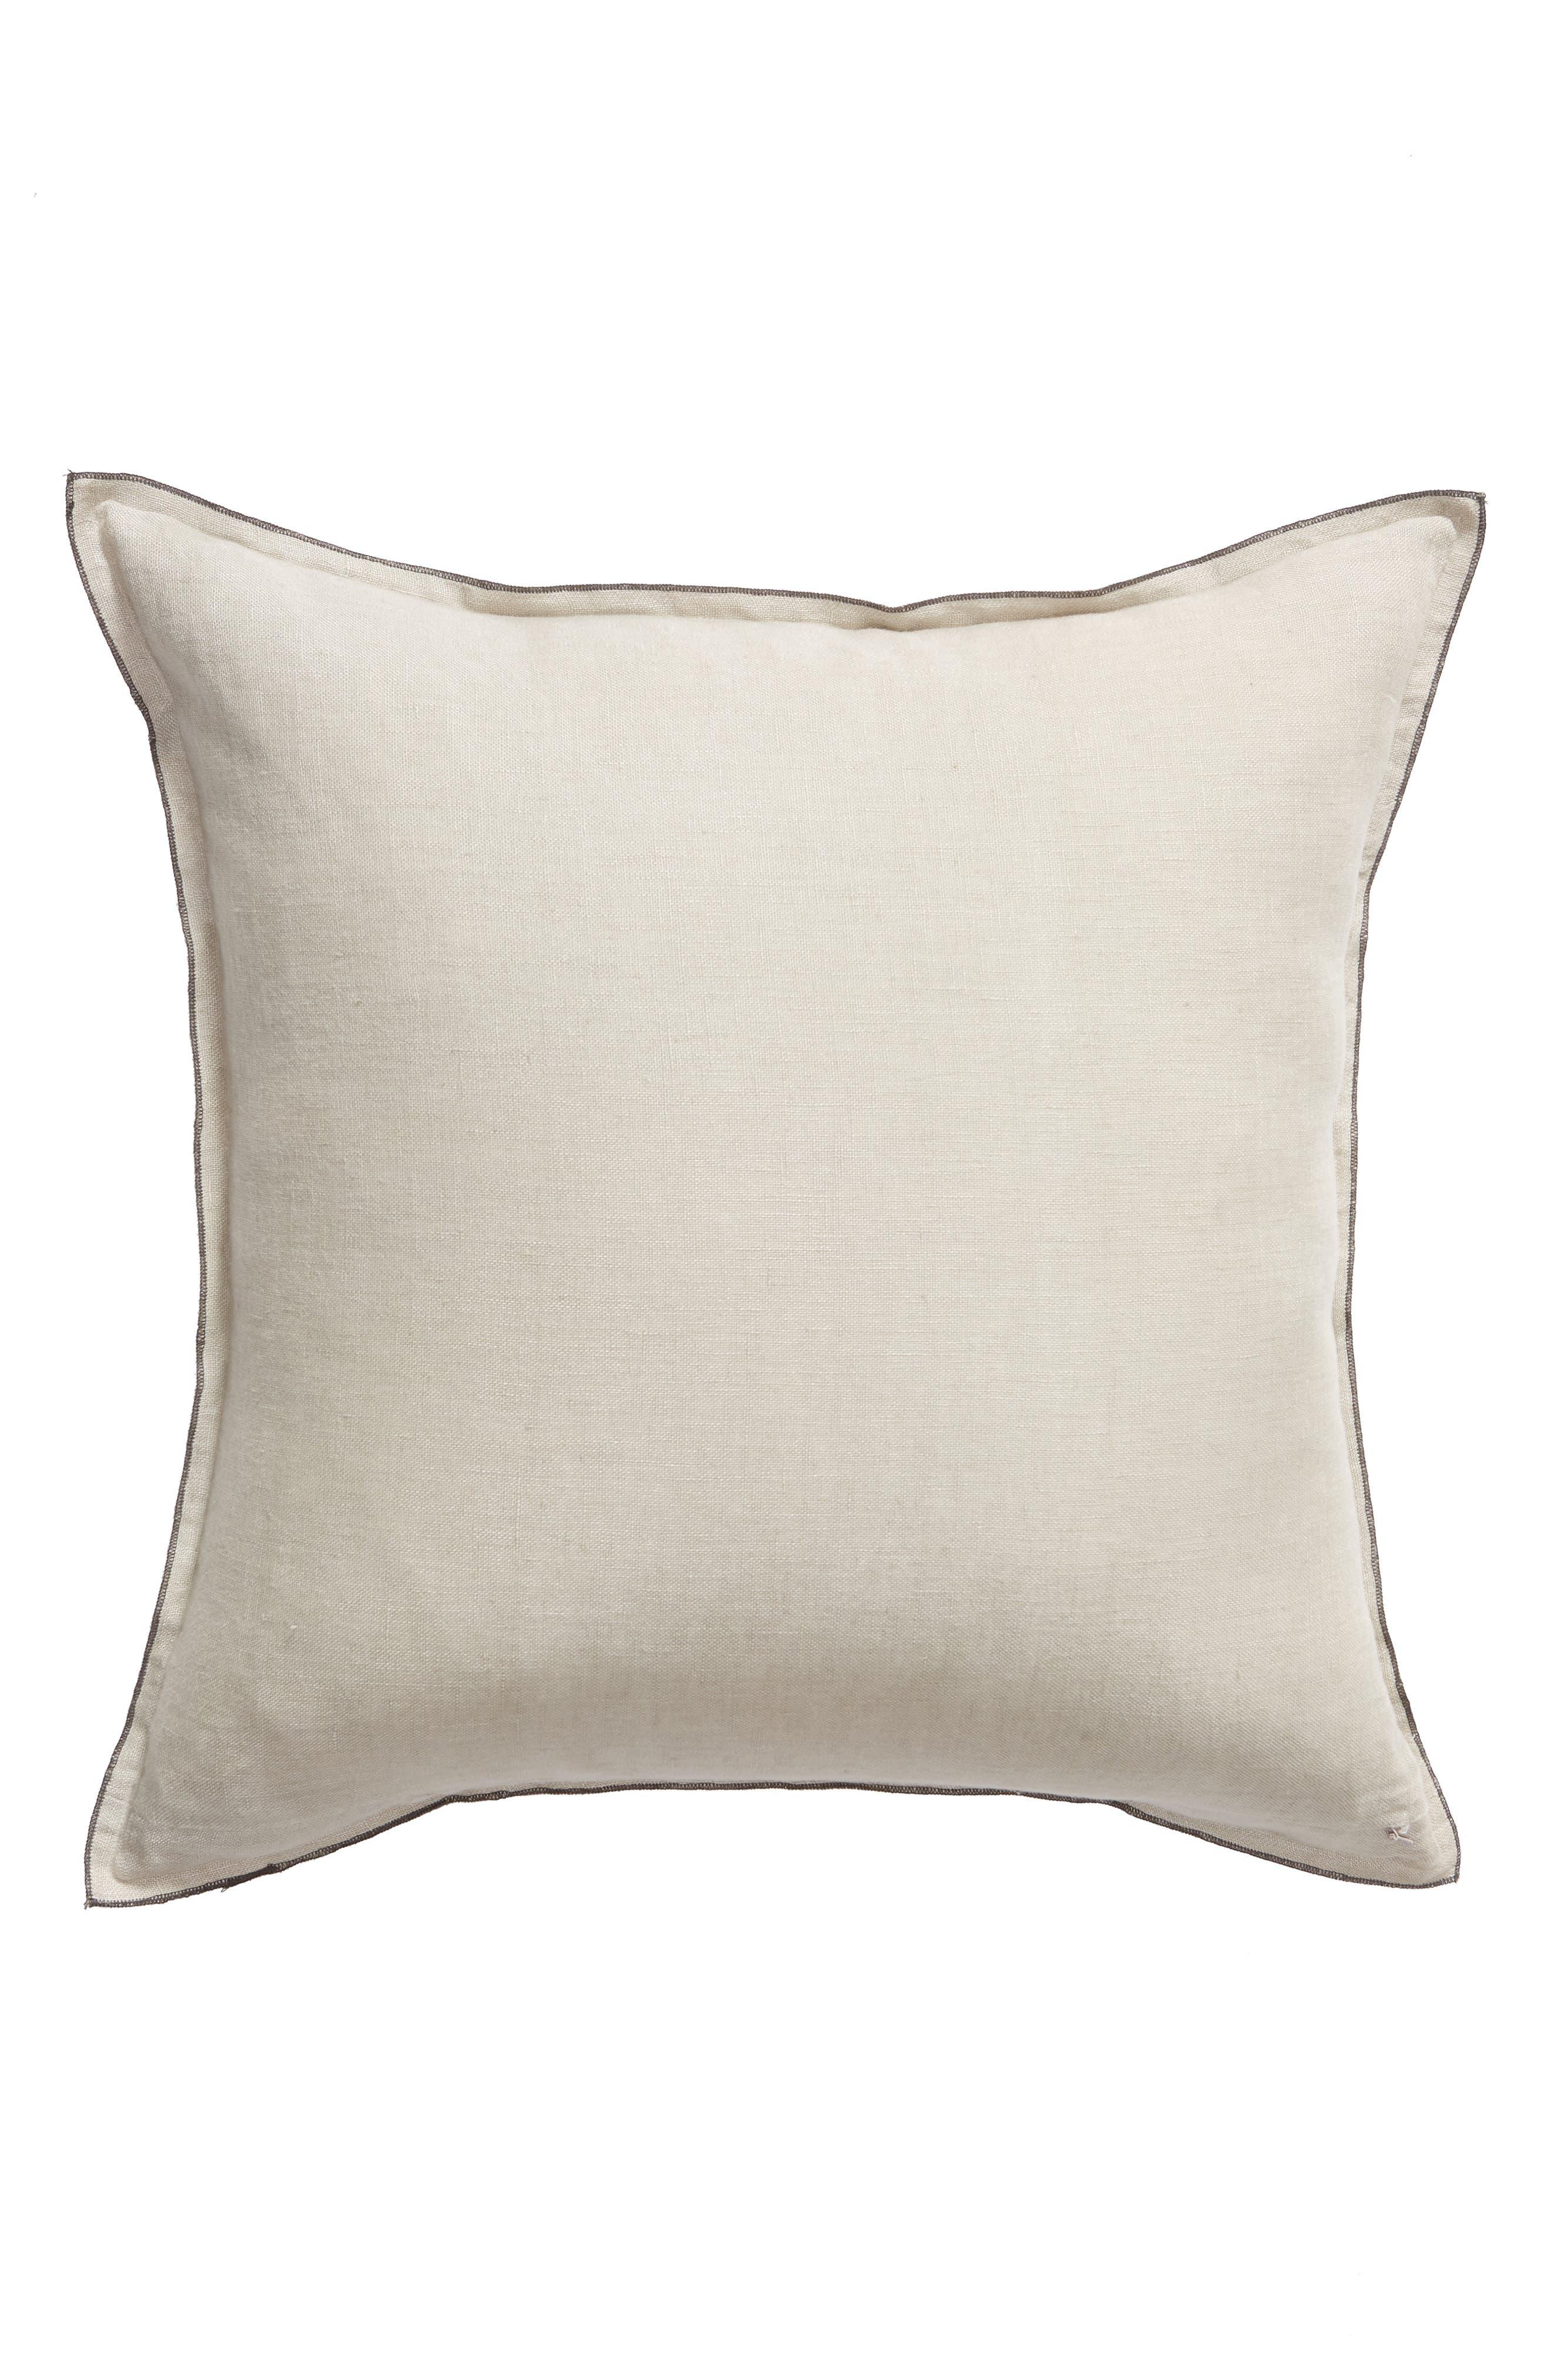 Linen Accent Pillow,                             Alternate thumbnail 2, color,                             GREY OWL